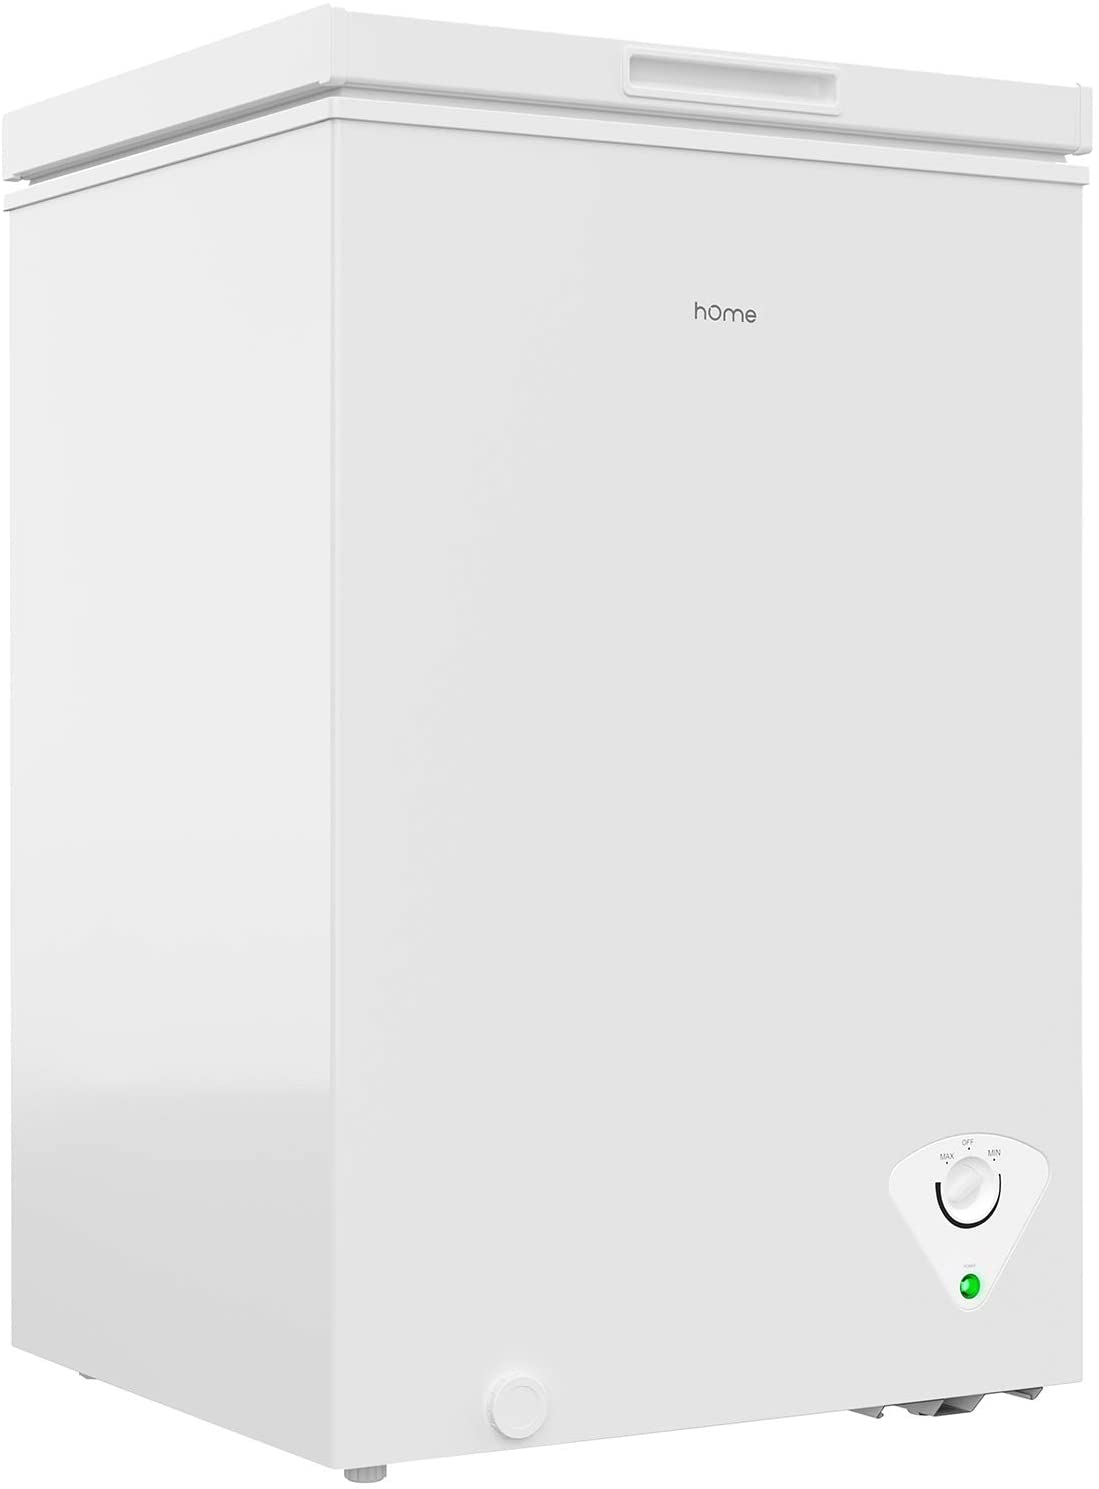 hOmeLabs 3.5 Cu. Ft. Chest Freezer